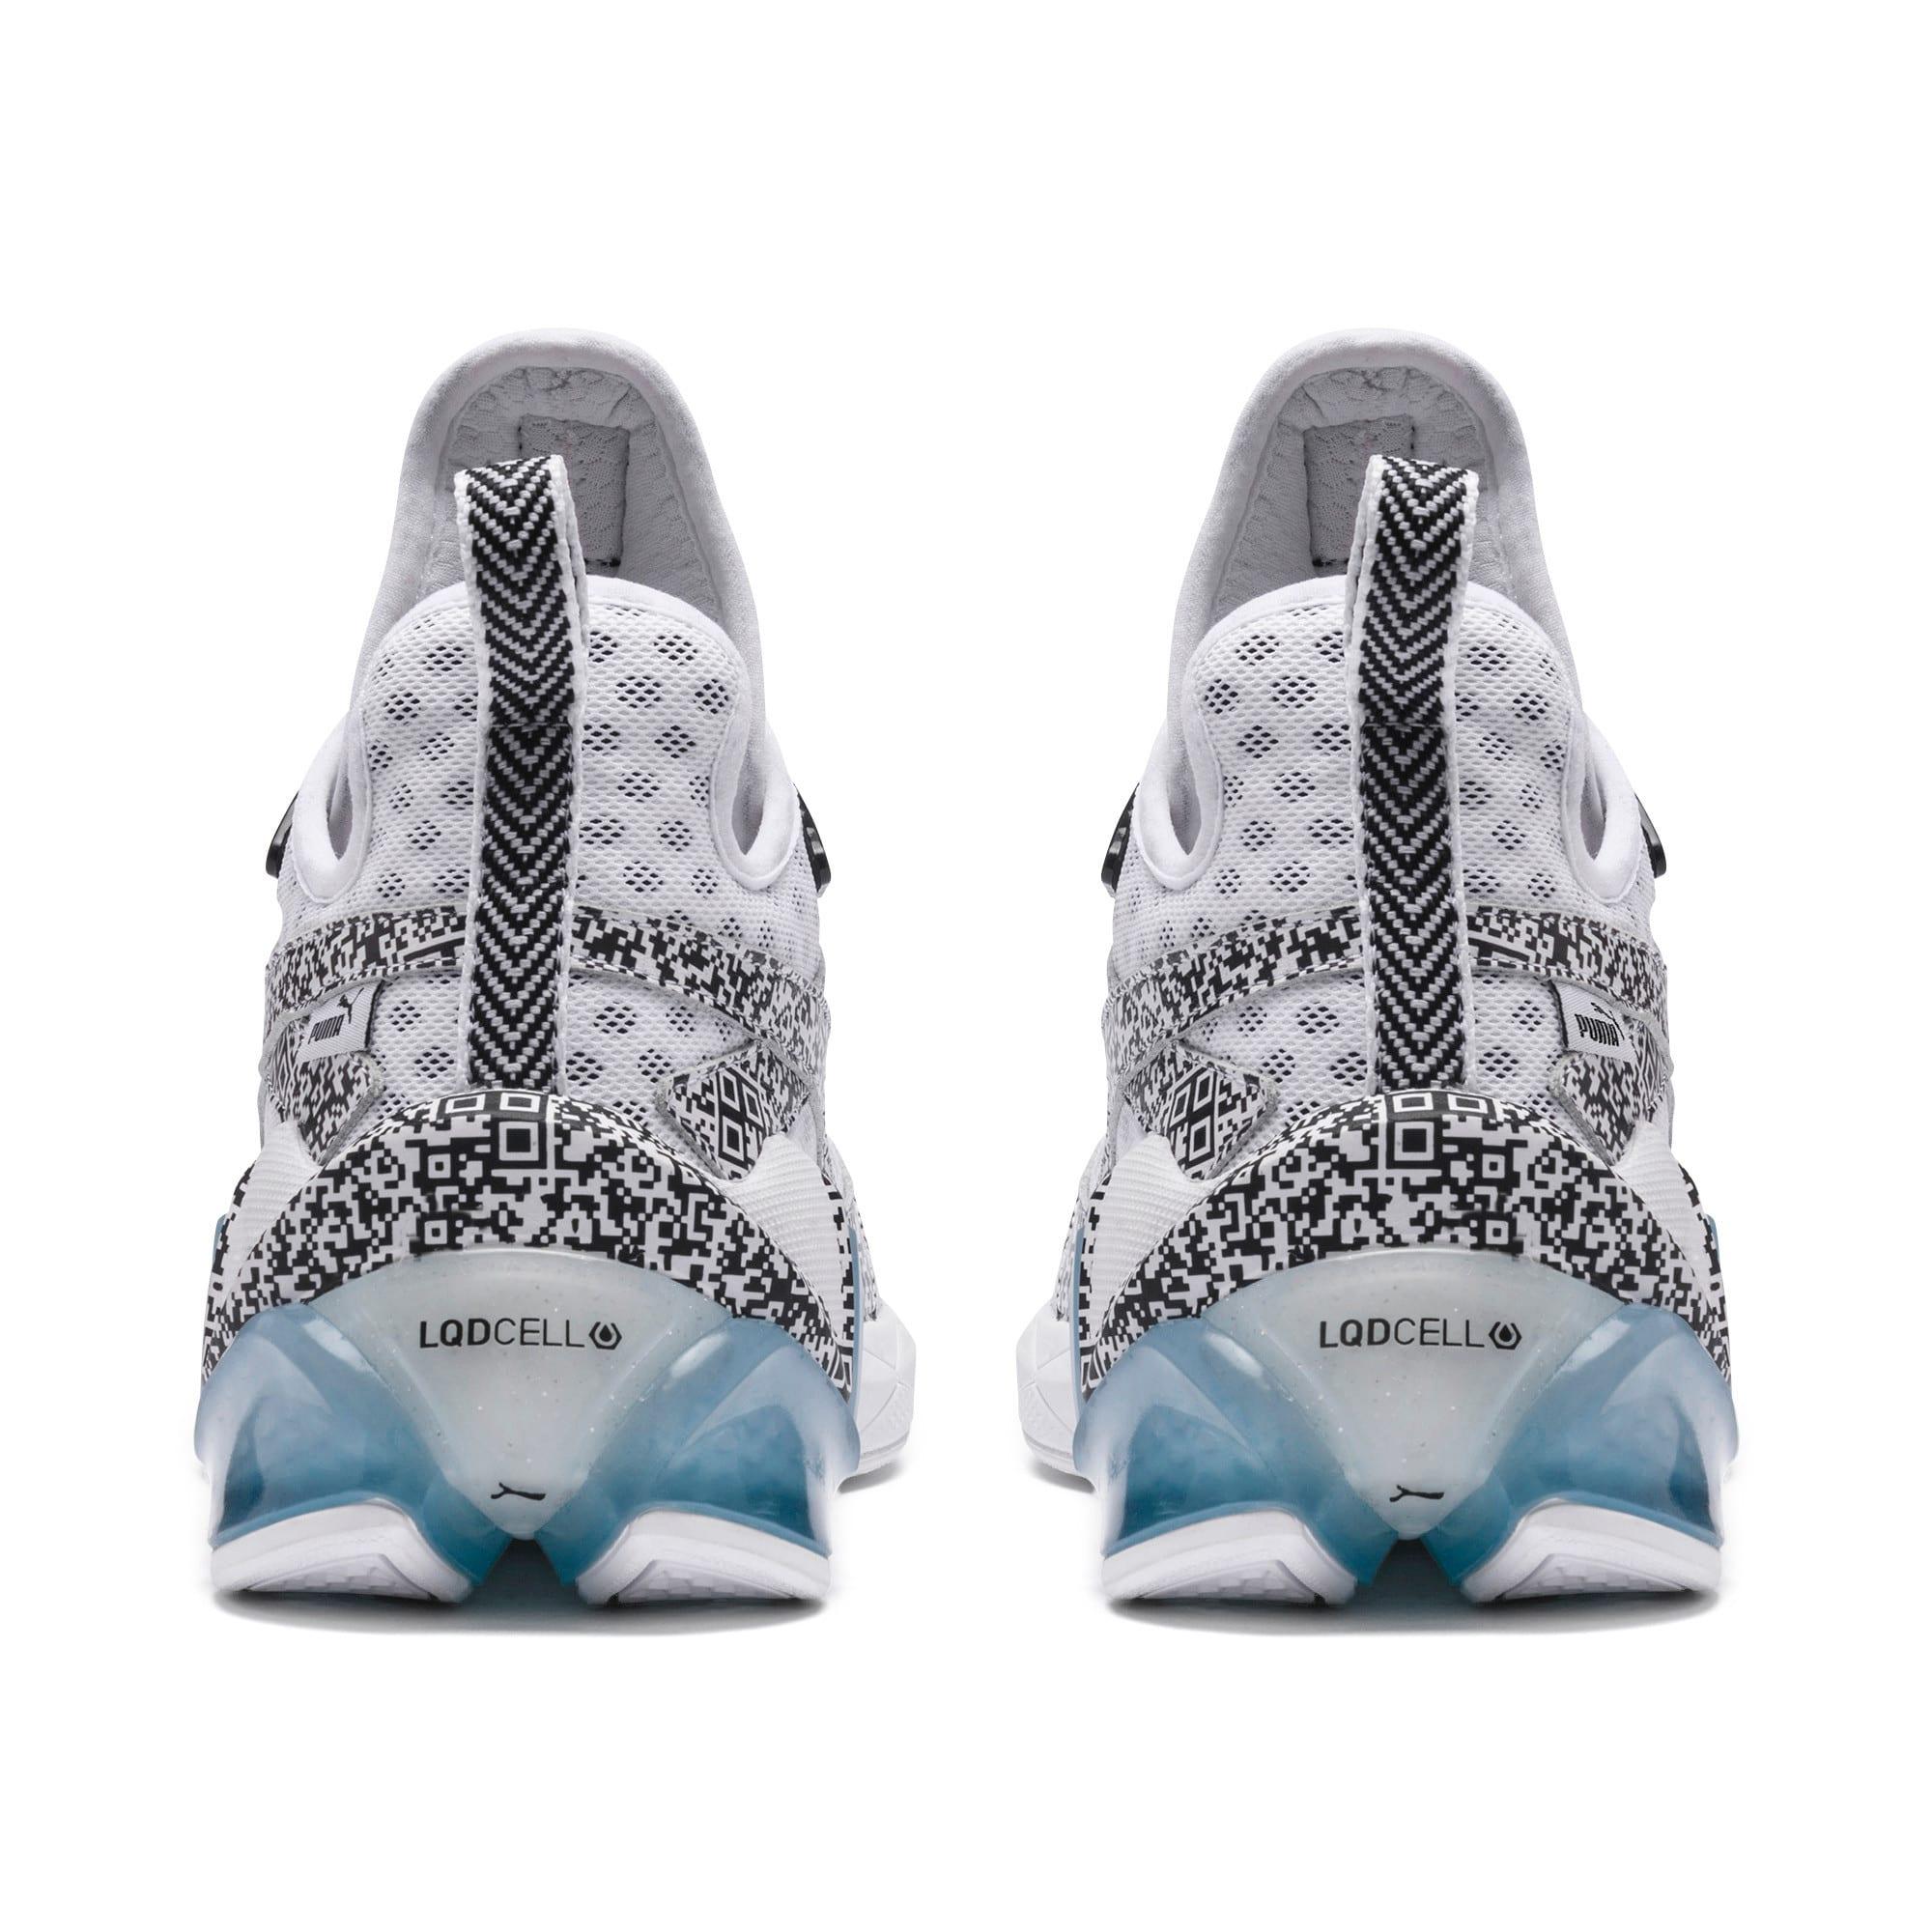 Thumbnail 3 of LQDCELL Origin AR Sneaker, Puma White-Puma Black, medium